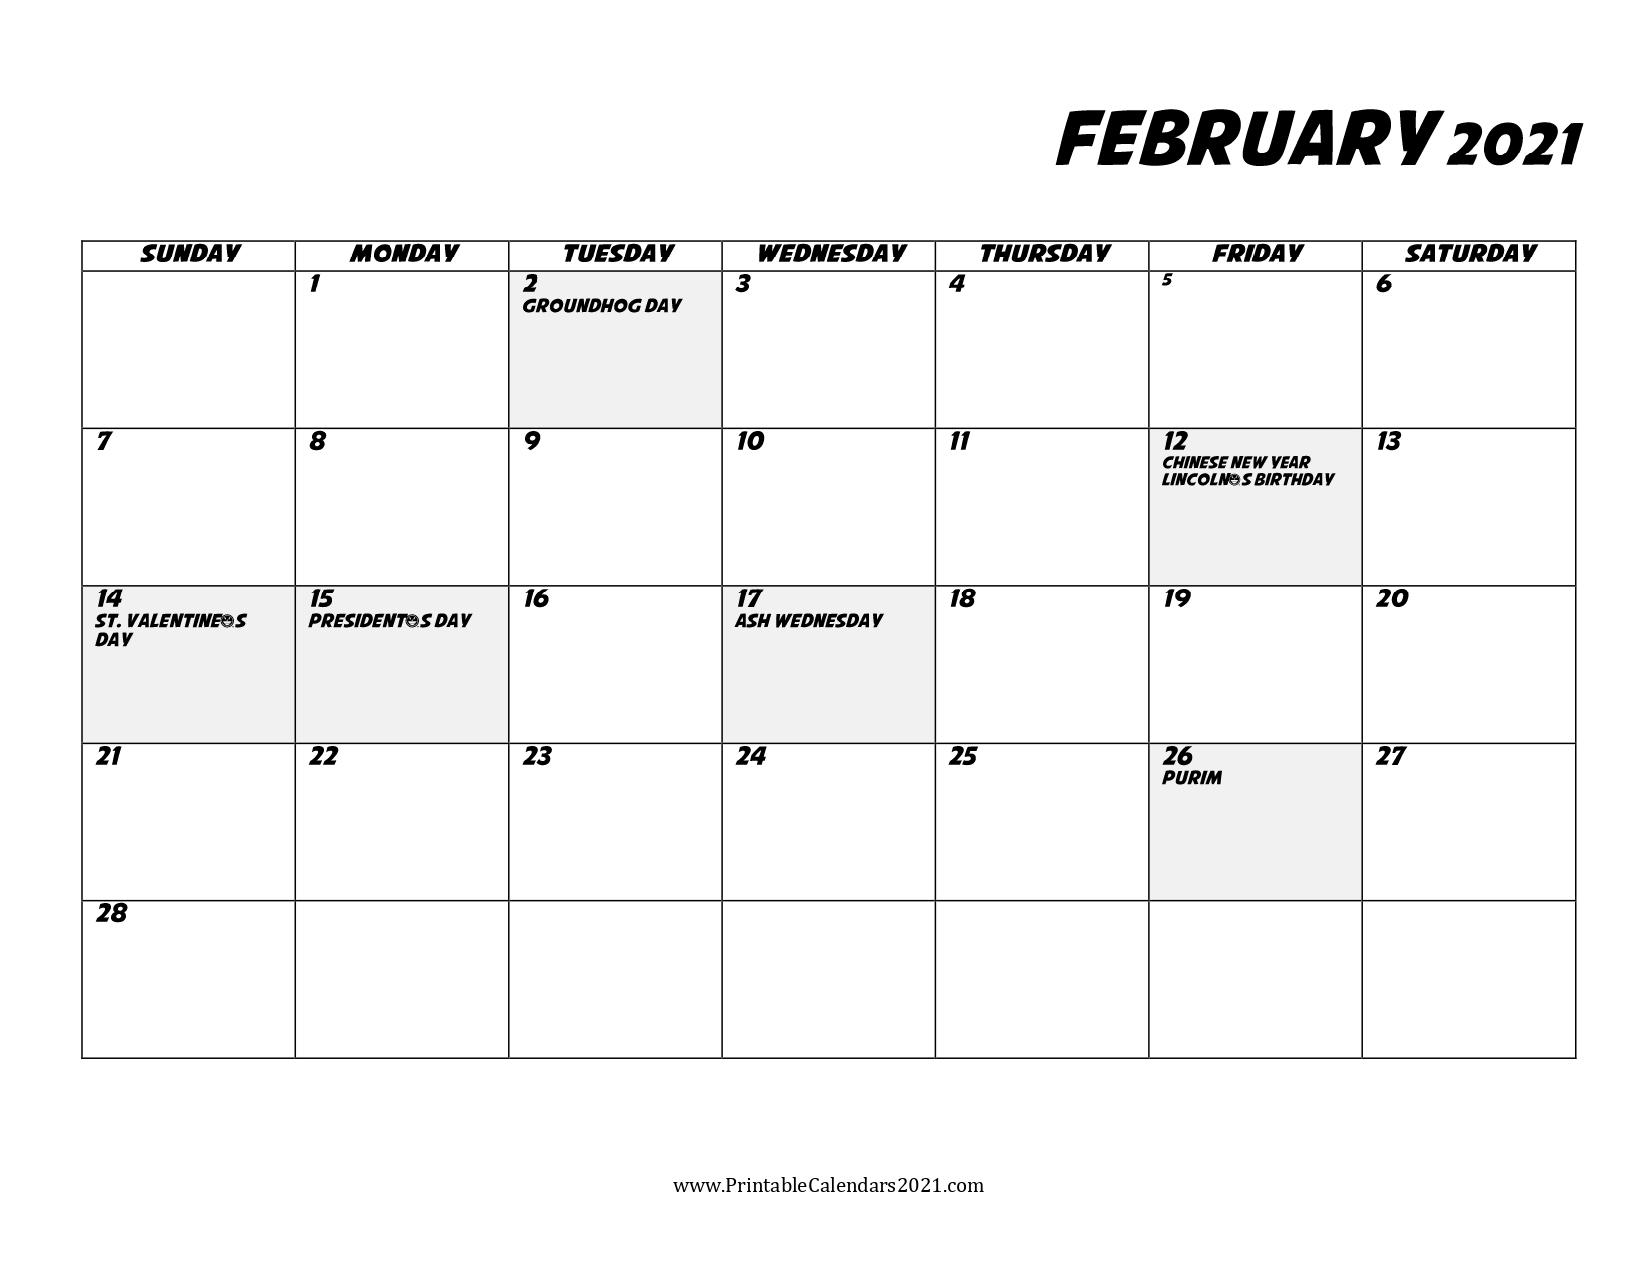 65 Free February 2021 Calendar Printable With Holidays 3